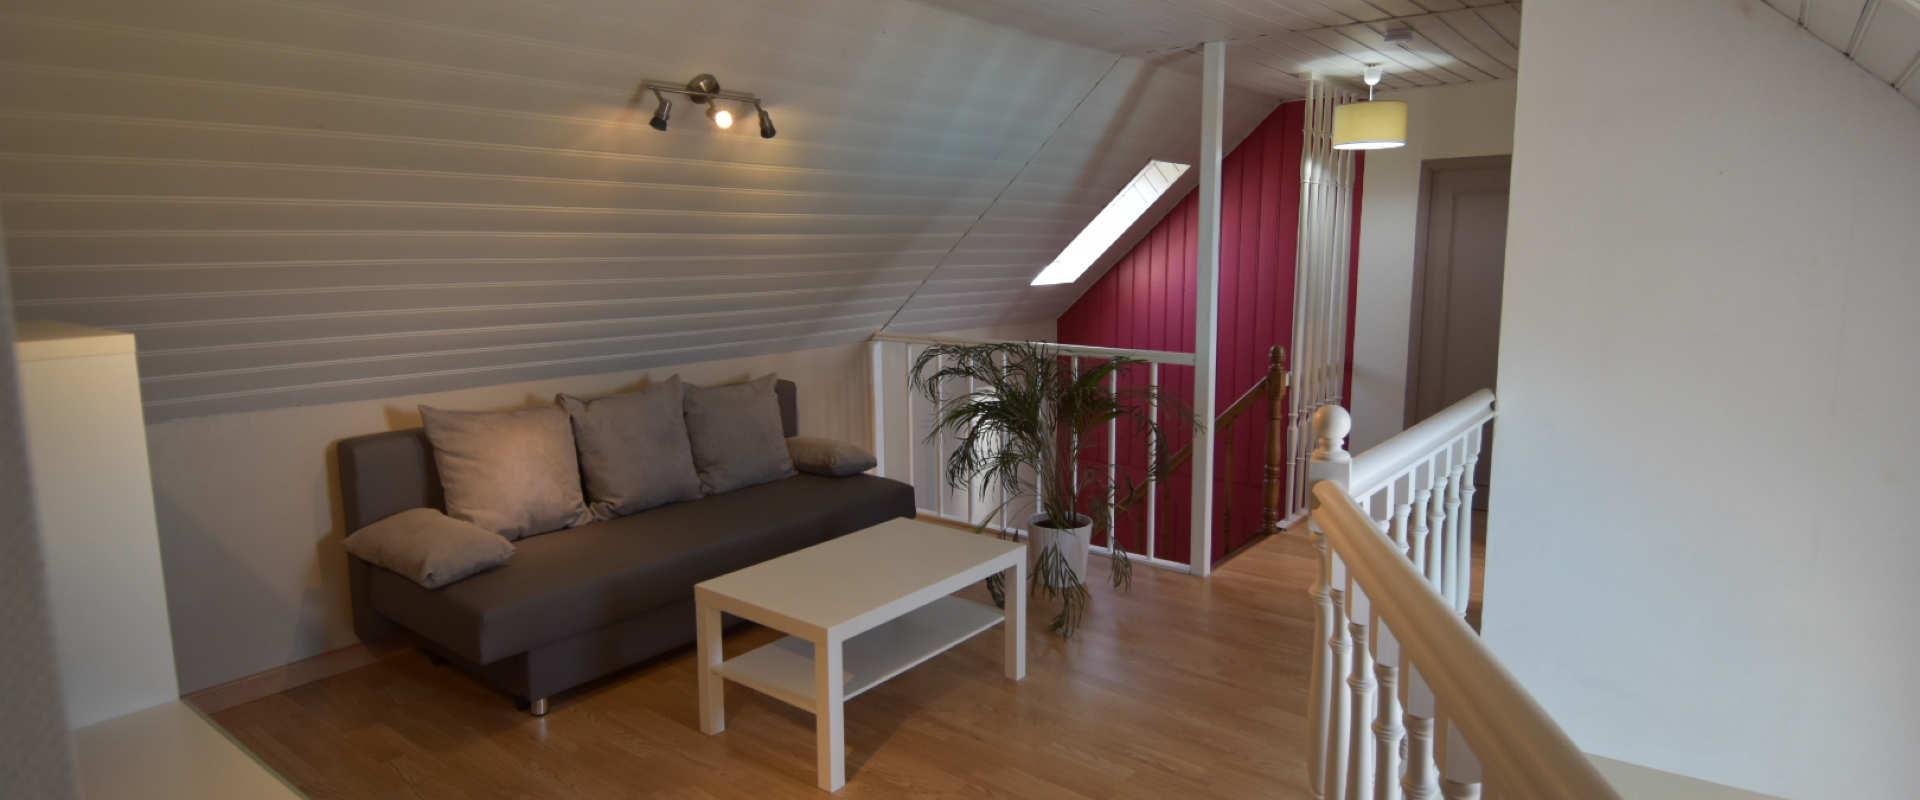 cleder8-salon-etage2.jpg